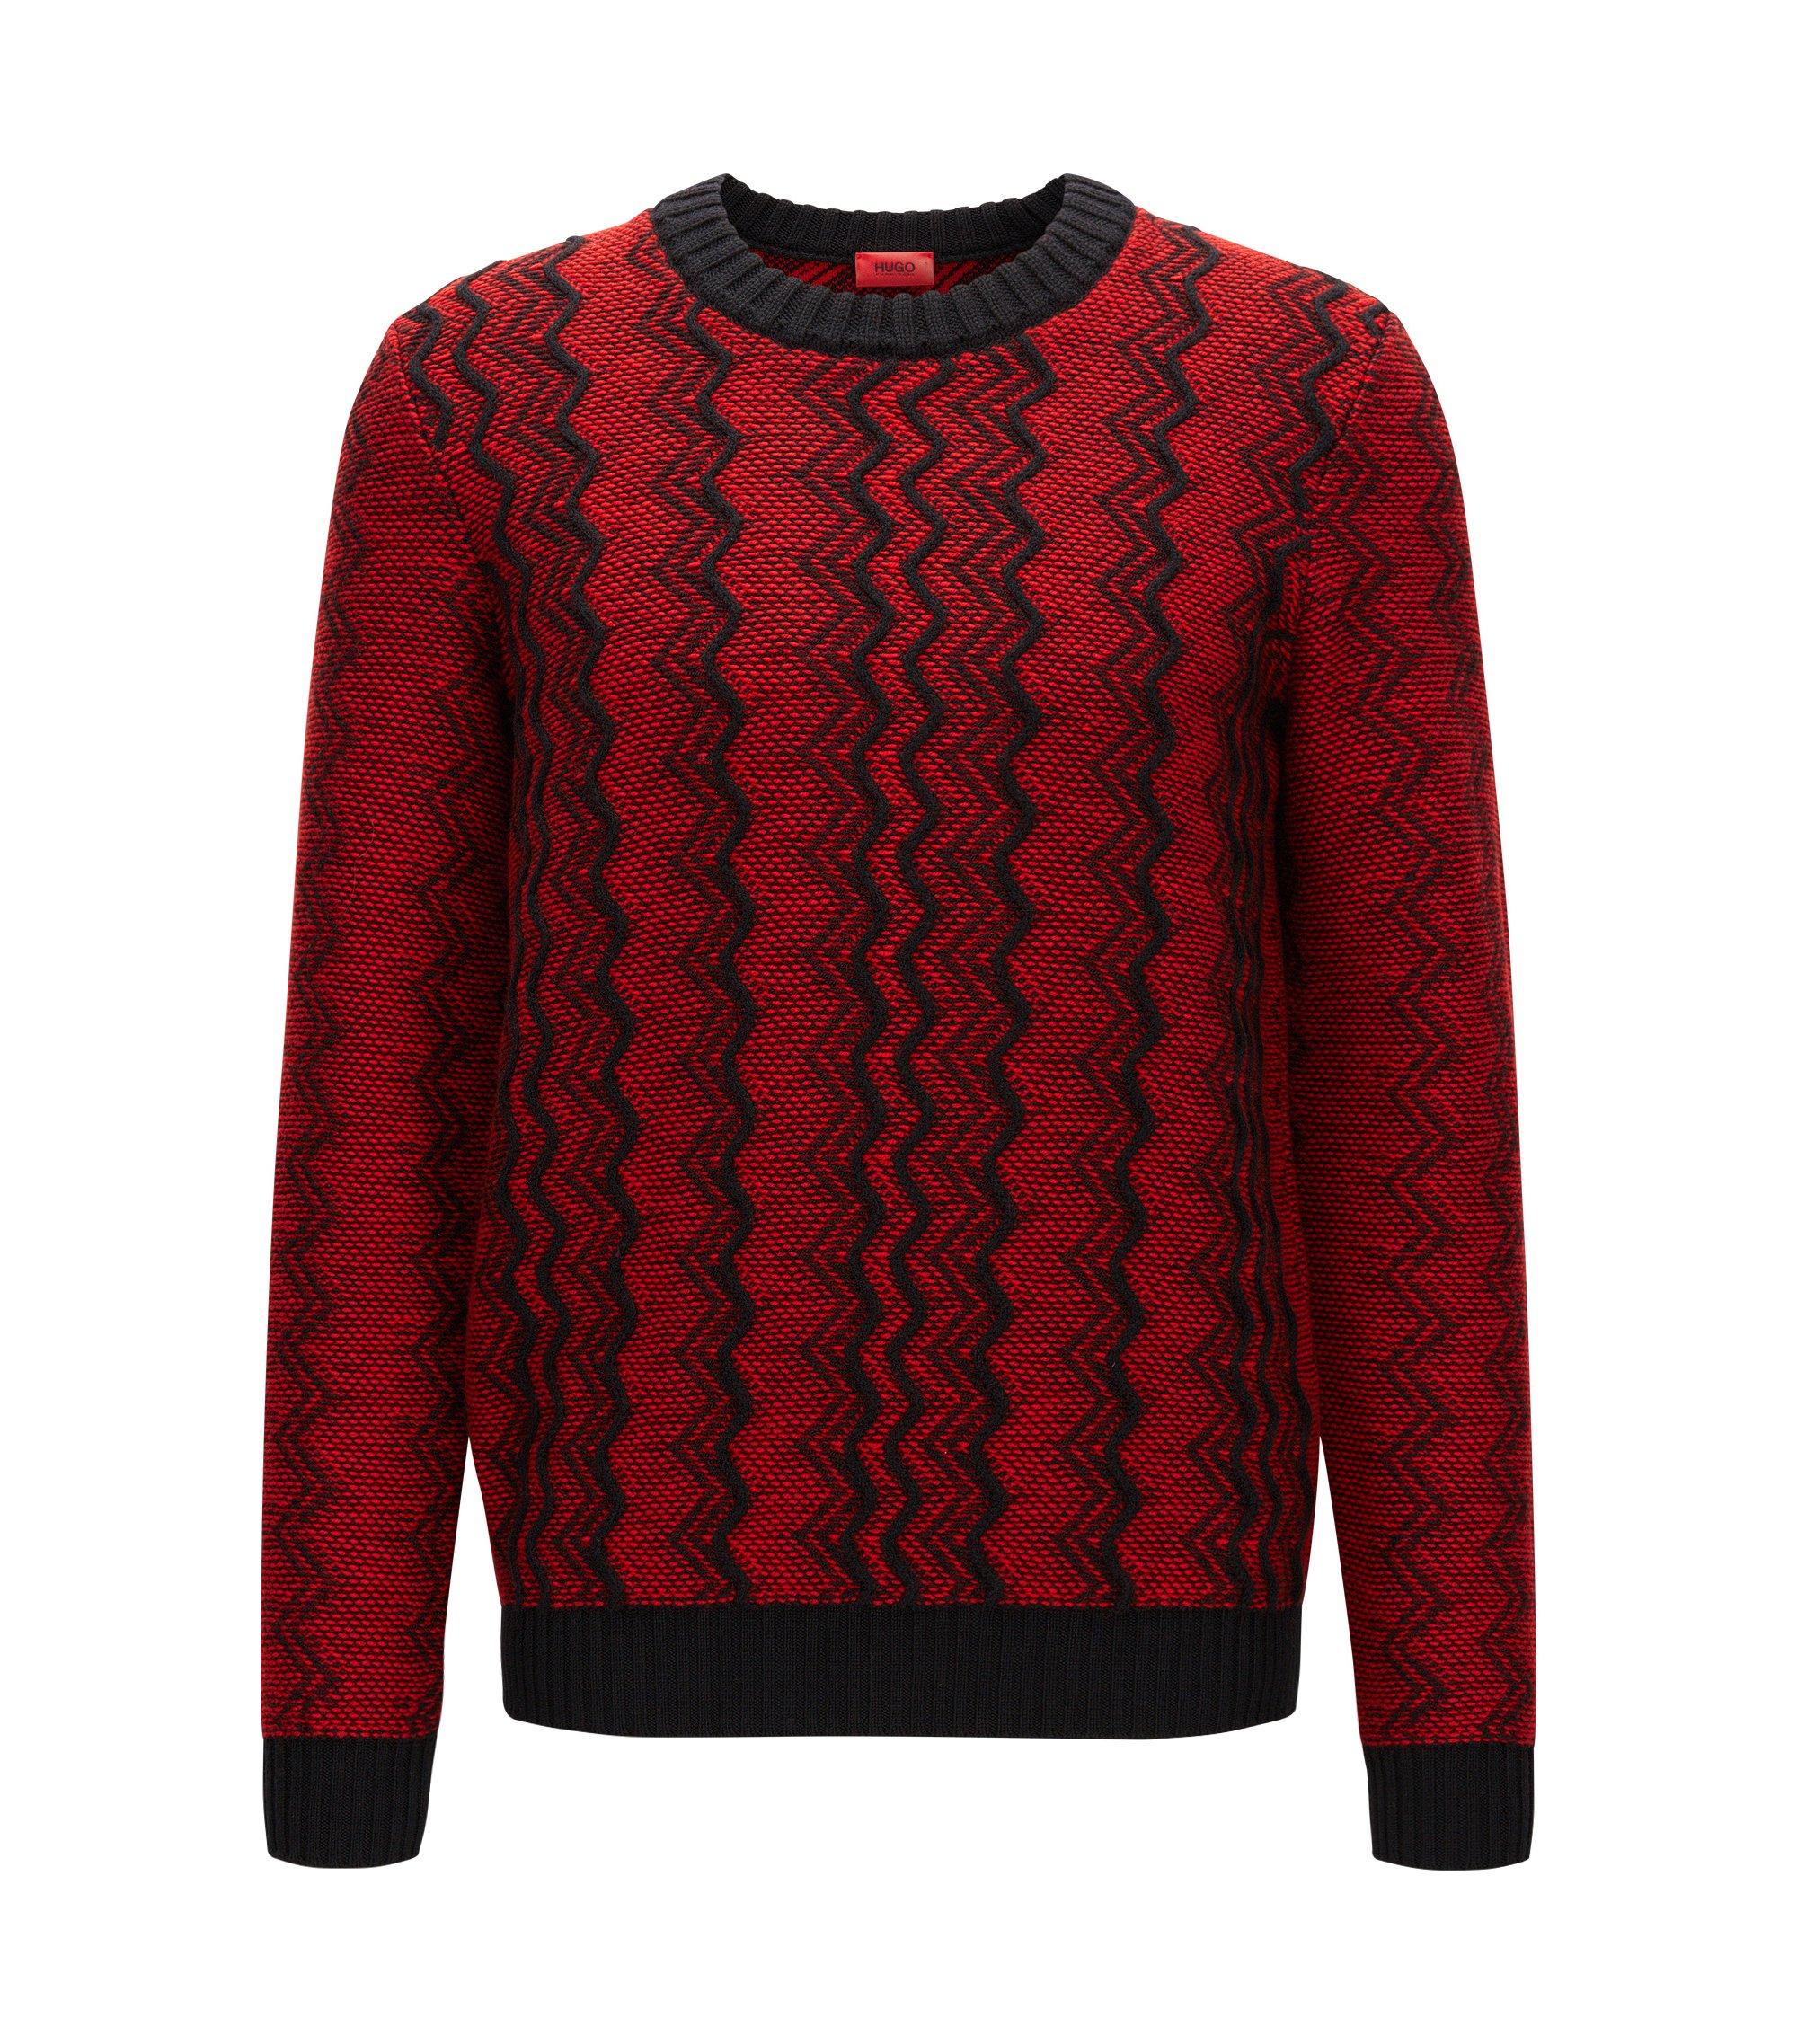 Zigzag sweater in virgin wool jacquard, Red